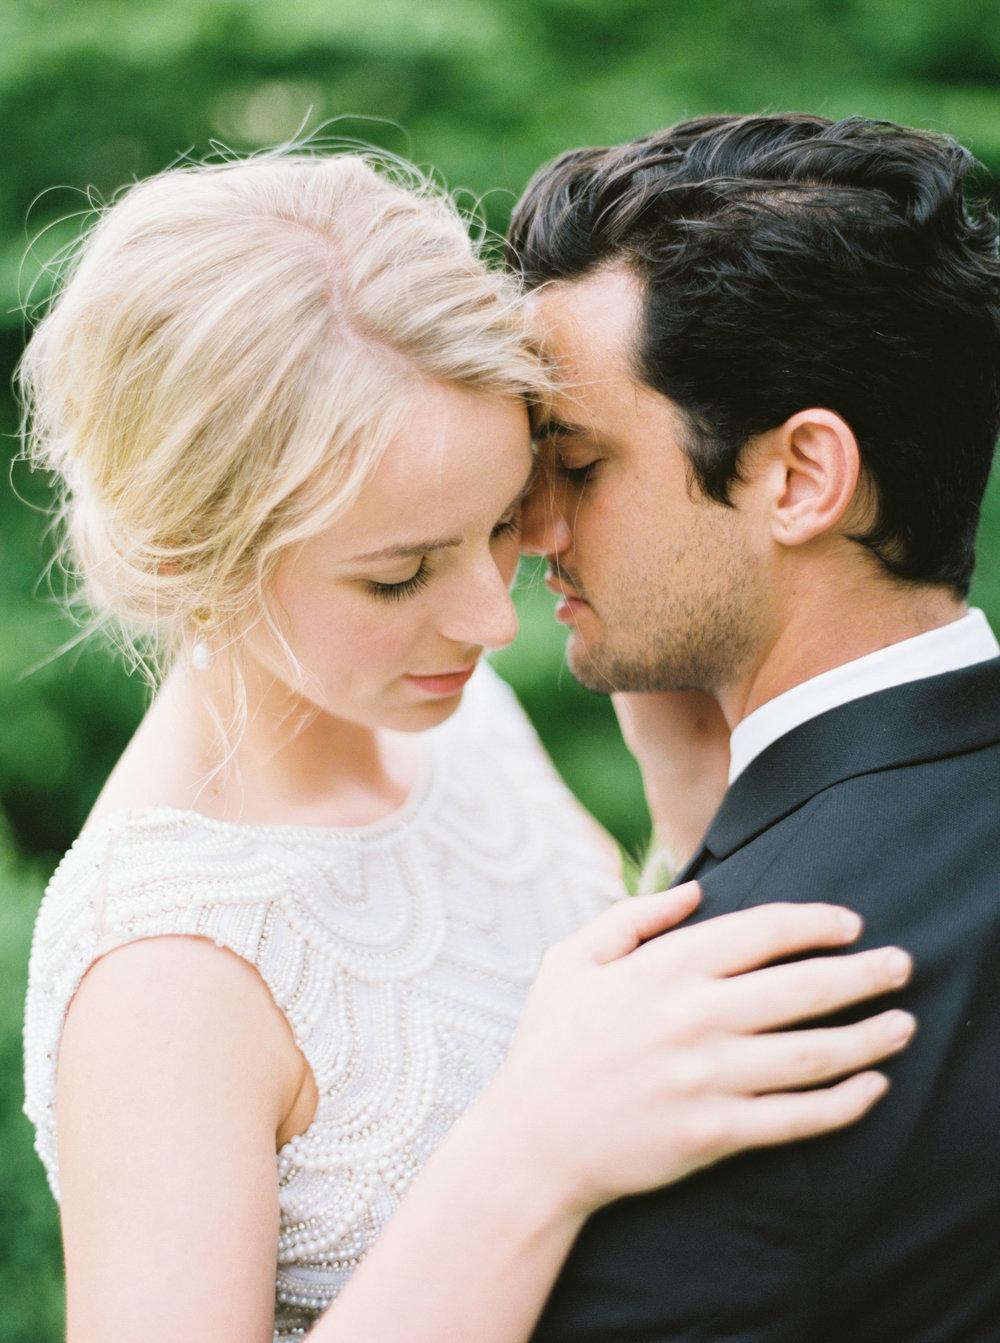 Timeless Southern Highland Wedding Elopement in Bowral NSW Fine Art Film Photographer Sheri McMahon-39.jpg